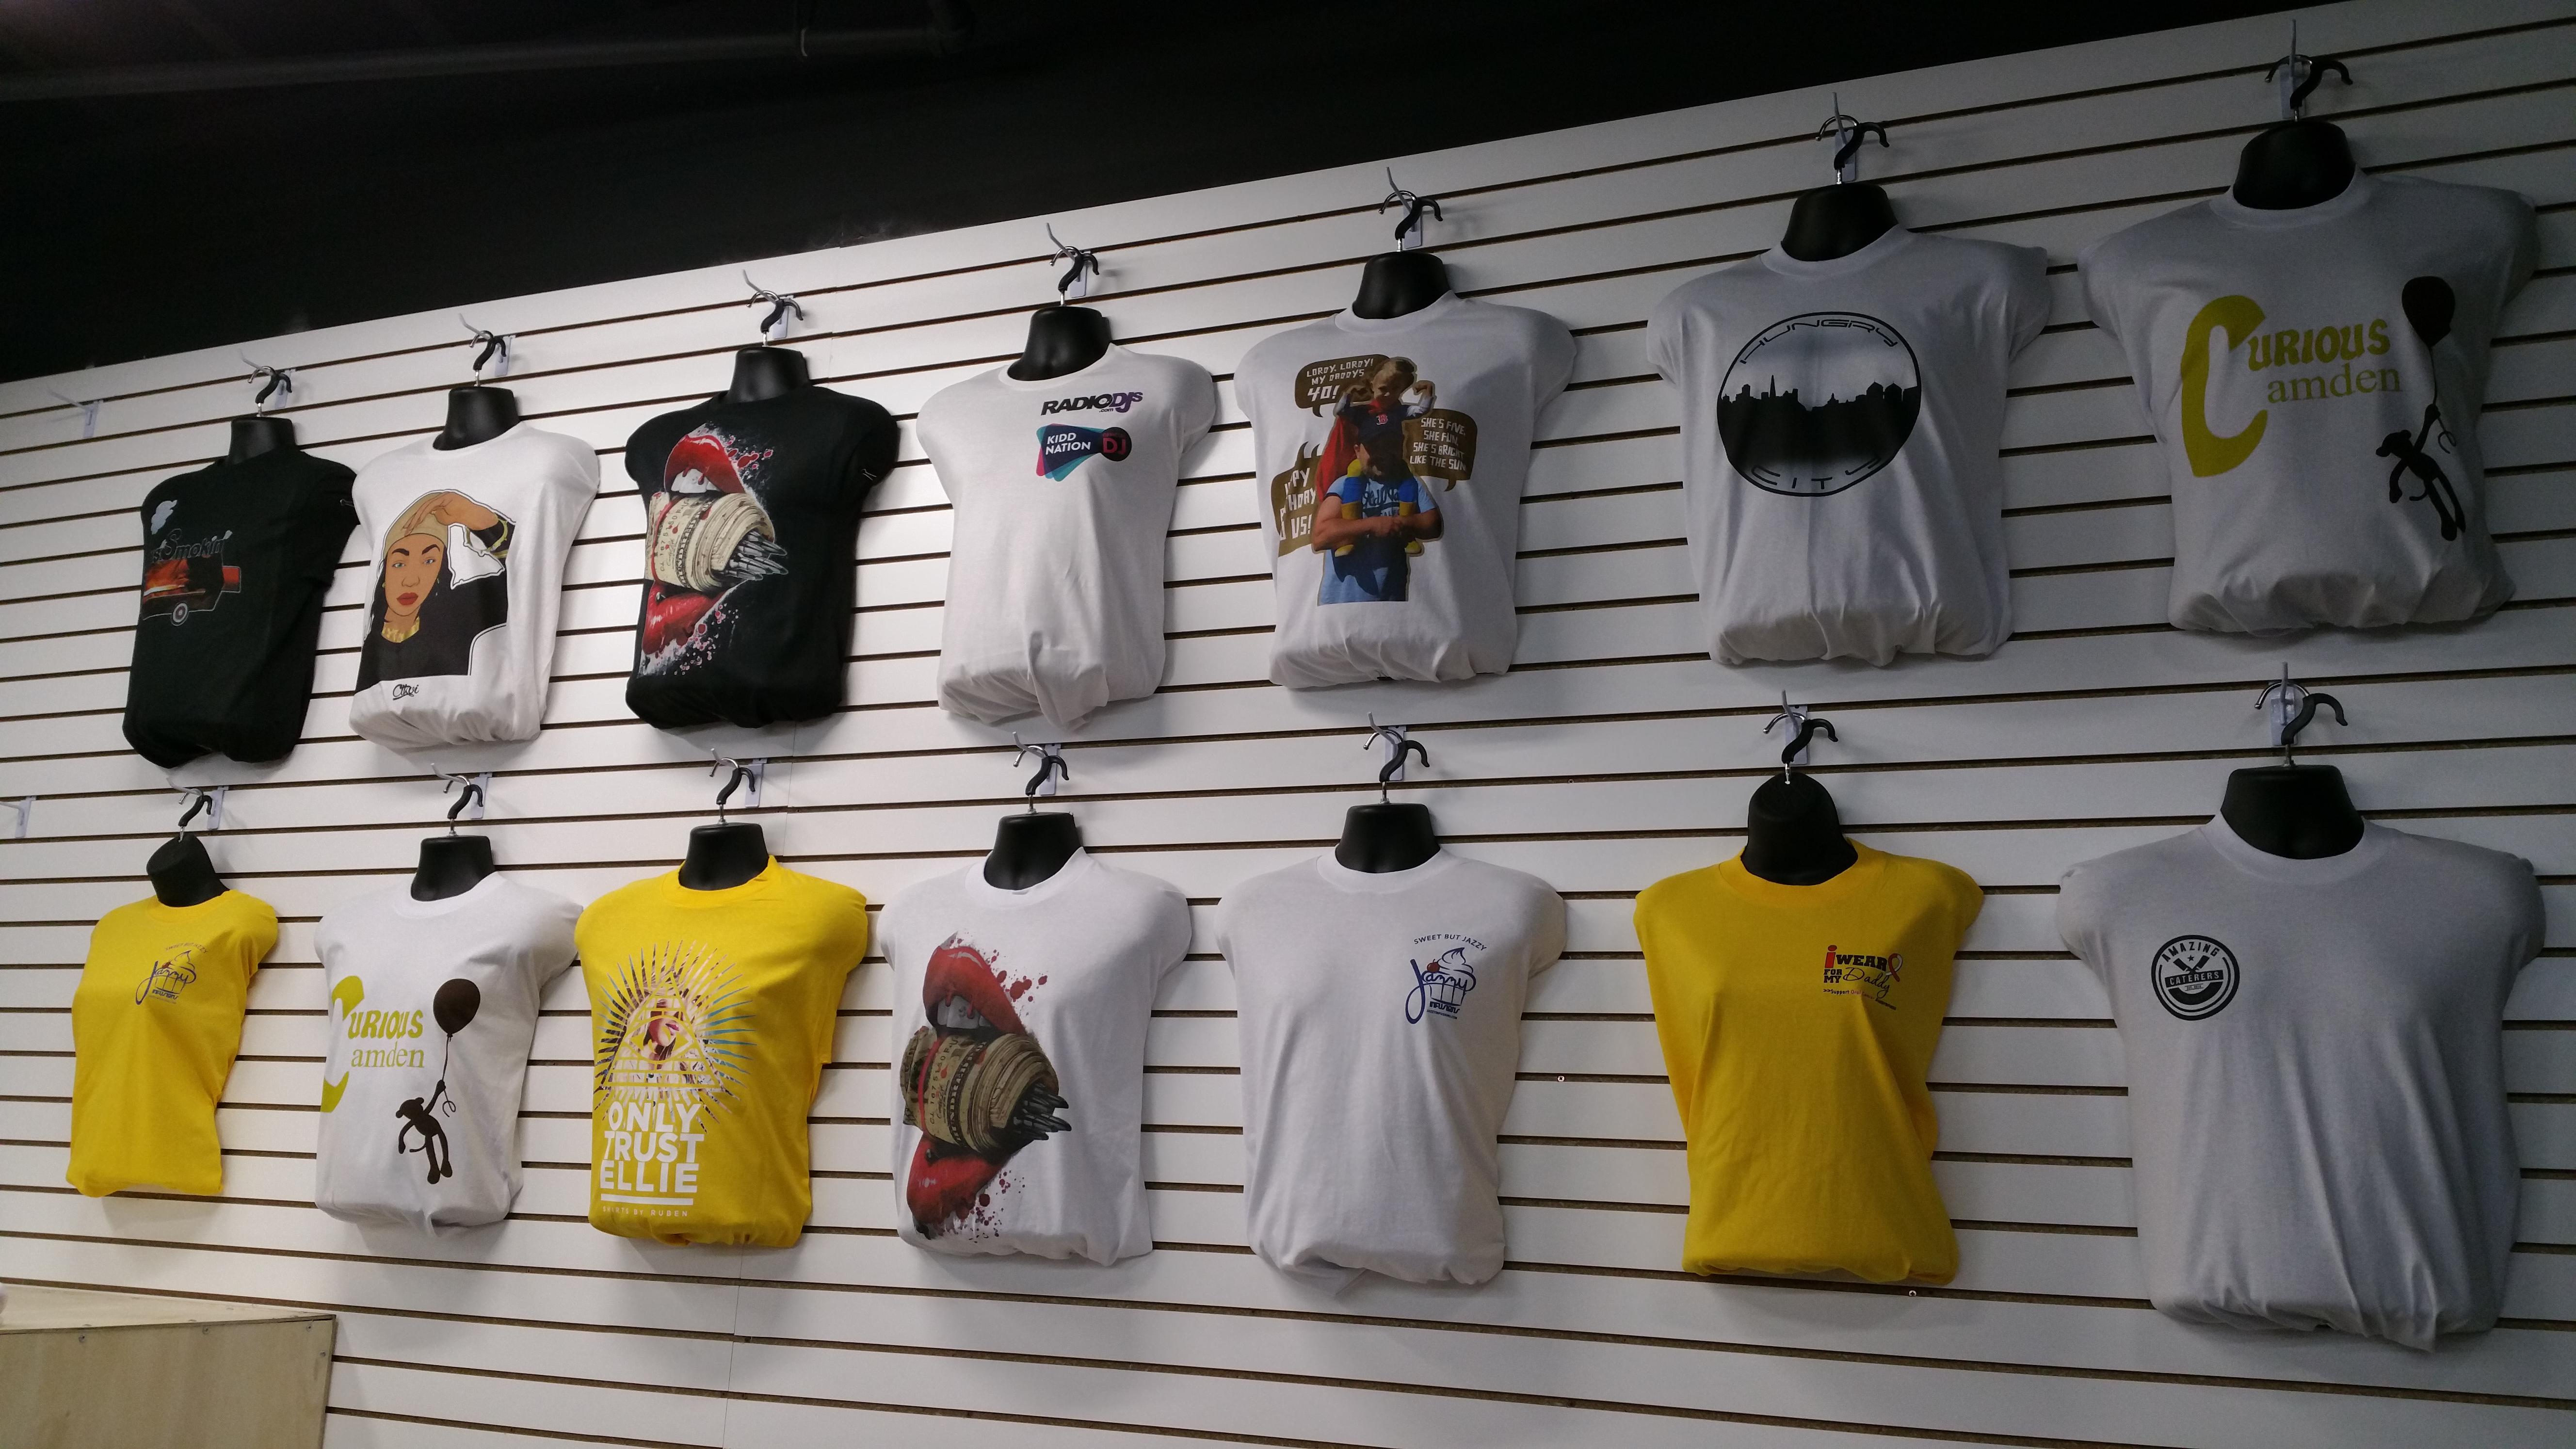 wholesale t shirts N image 42